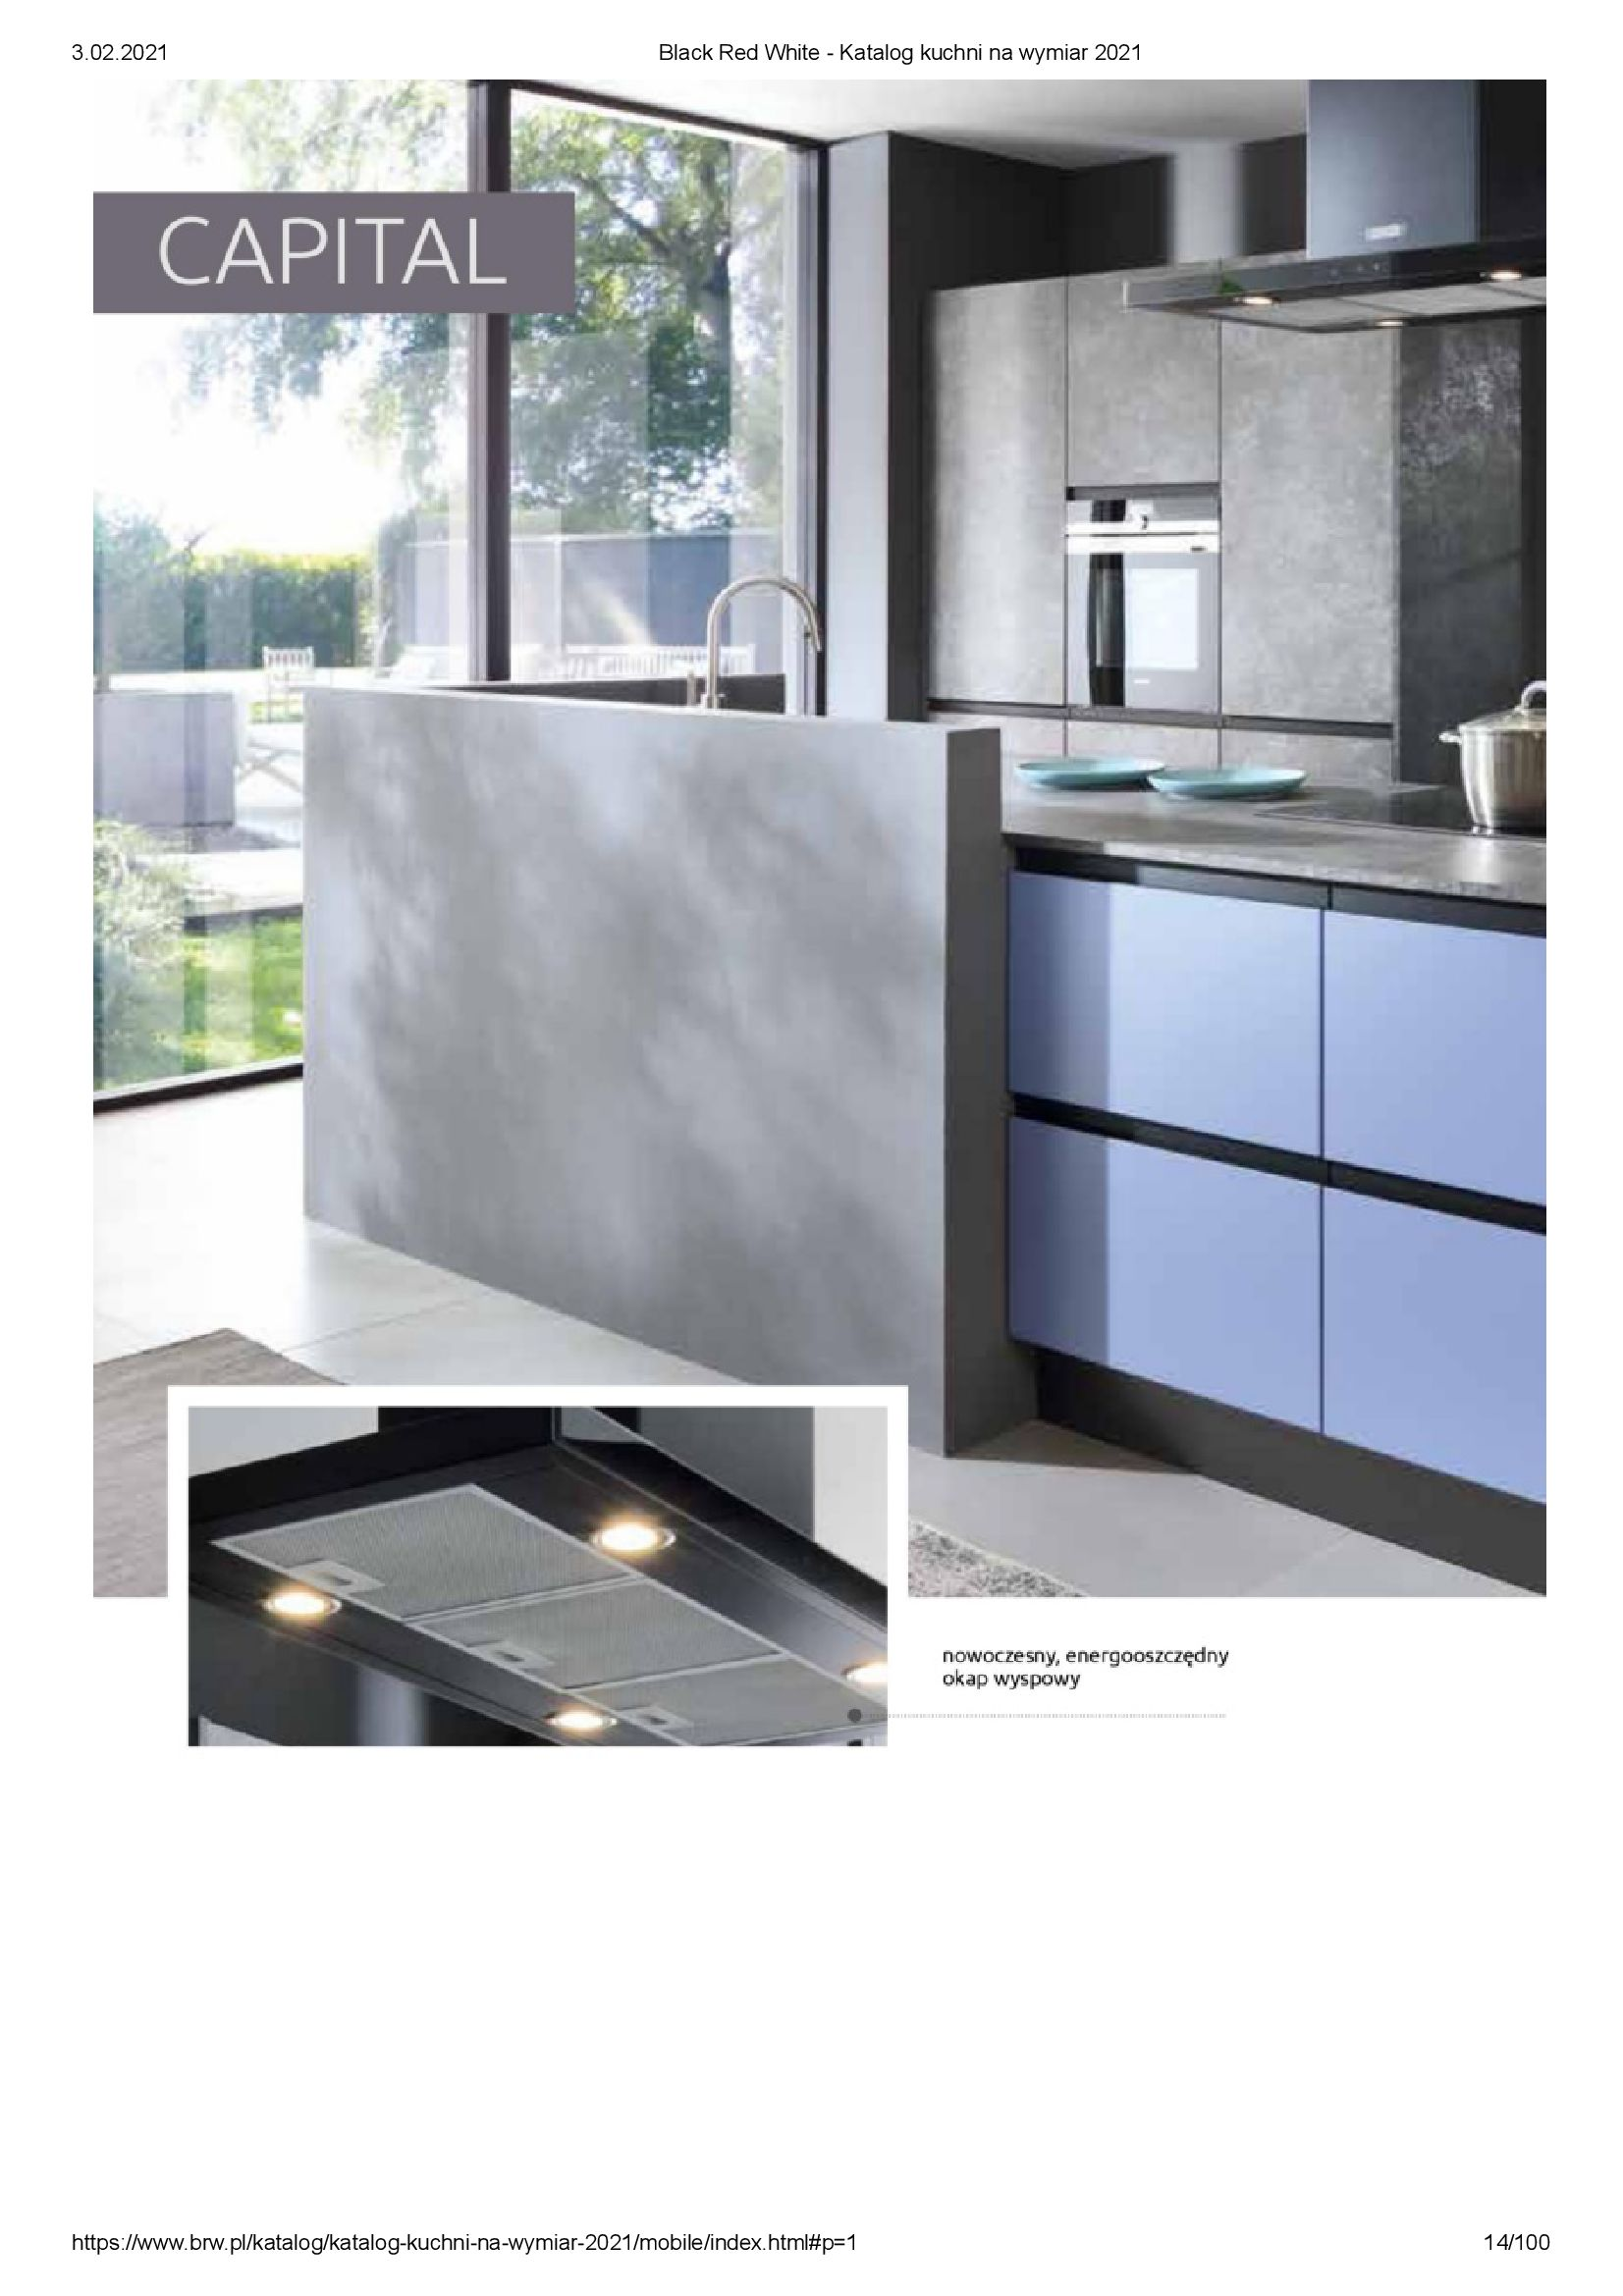 Gazetka Black Red White: Katalog - Kuchnie na wymiar Senso Kitchens 2021 2021-01-01 page-14